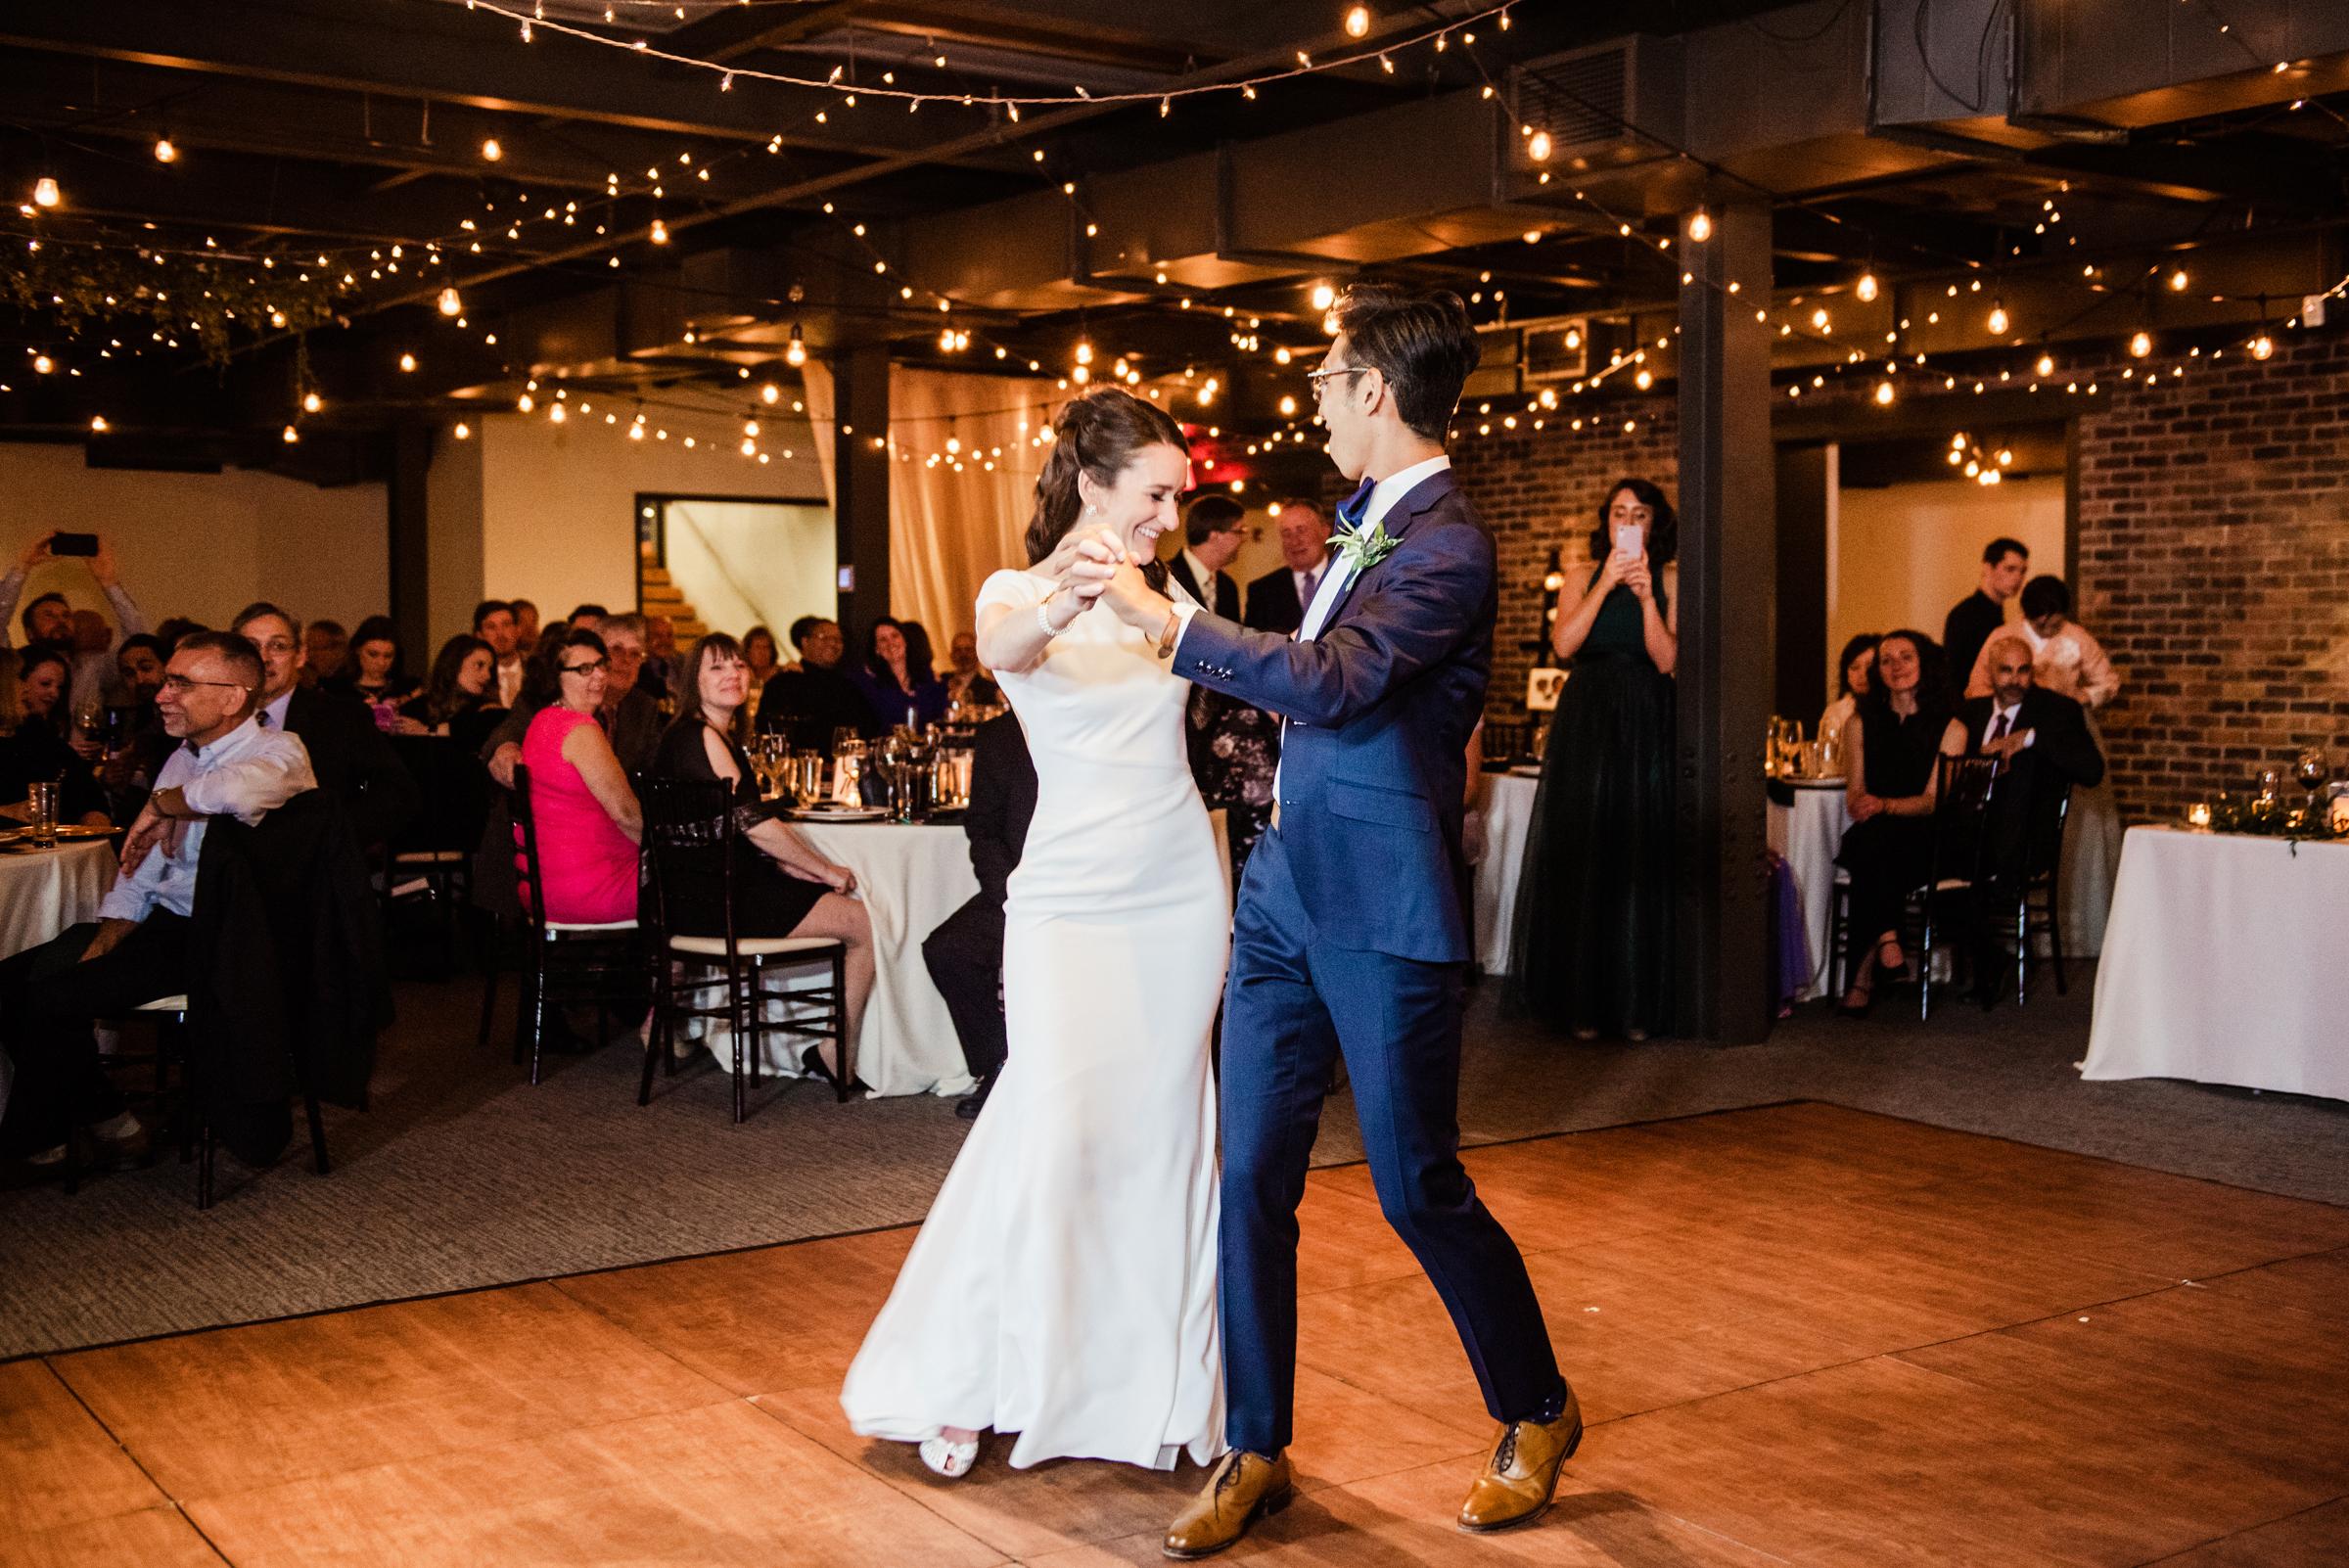 SKY_Armory_Syracuse_Wedding_JILL_STUDIO_Rochester_NY_Photographer_DSC_6311.jpg